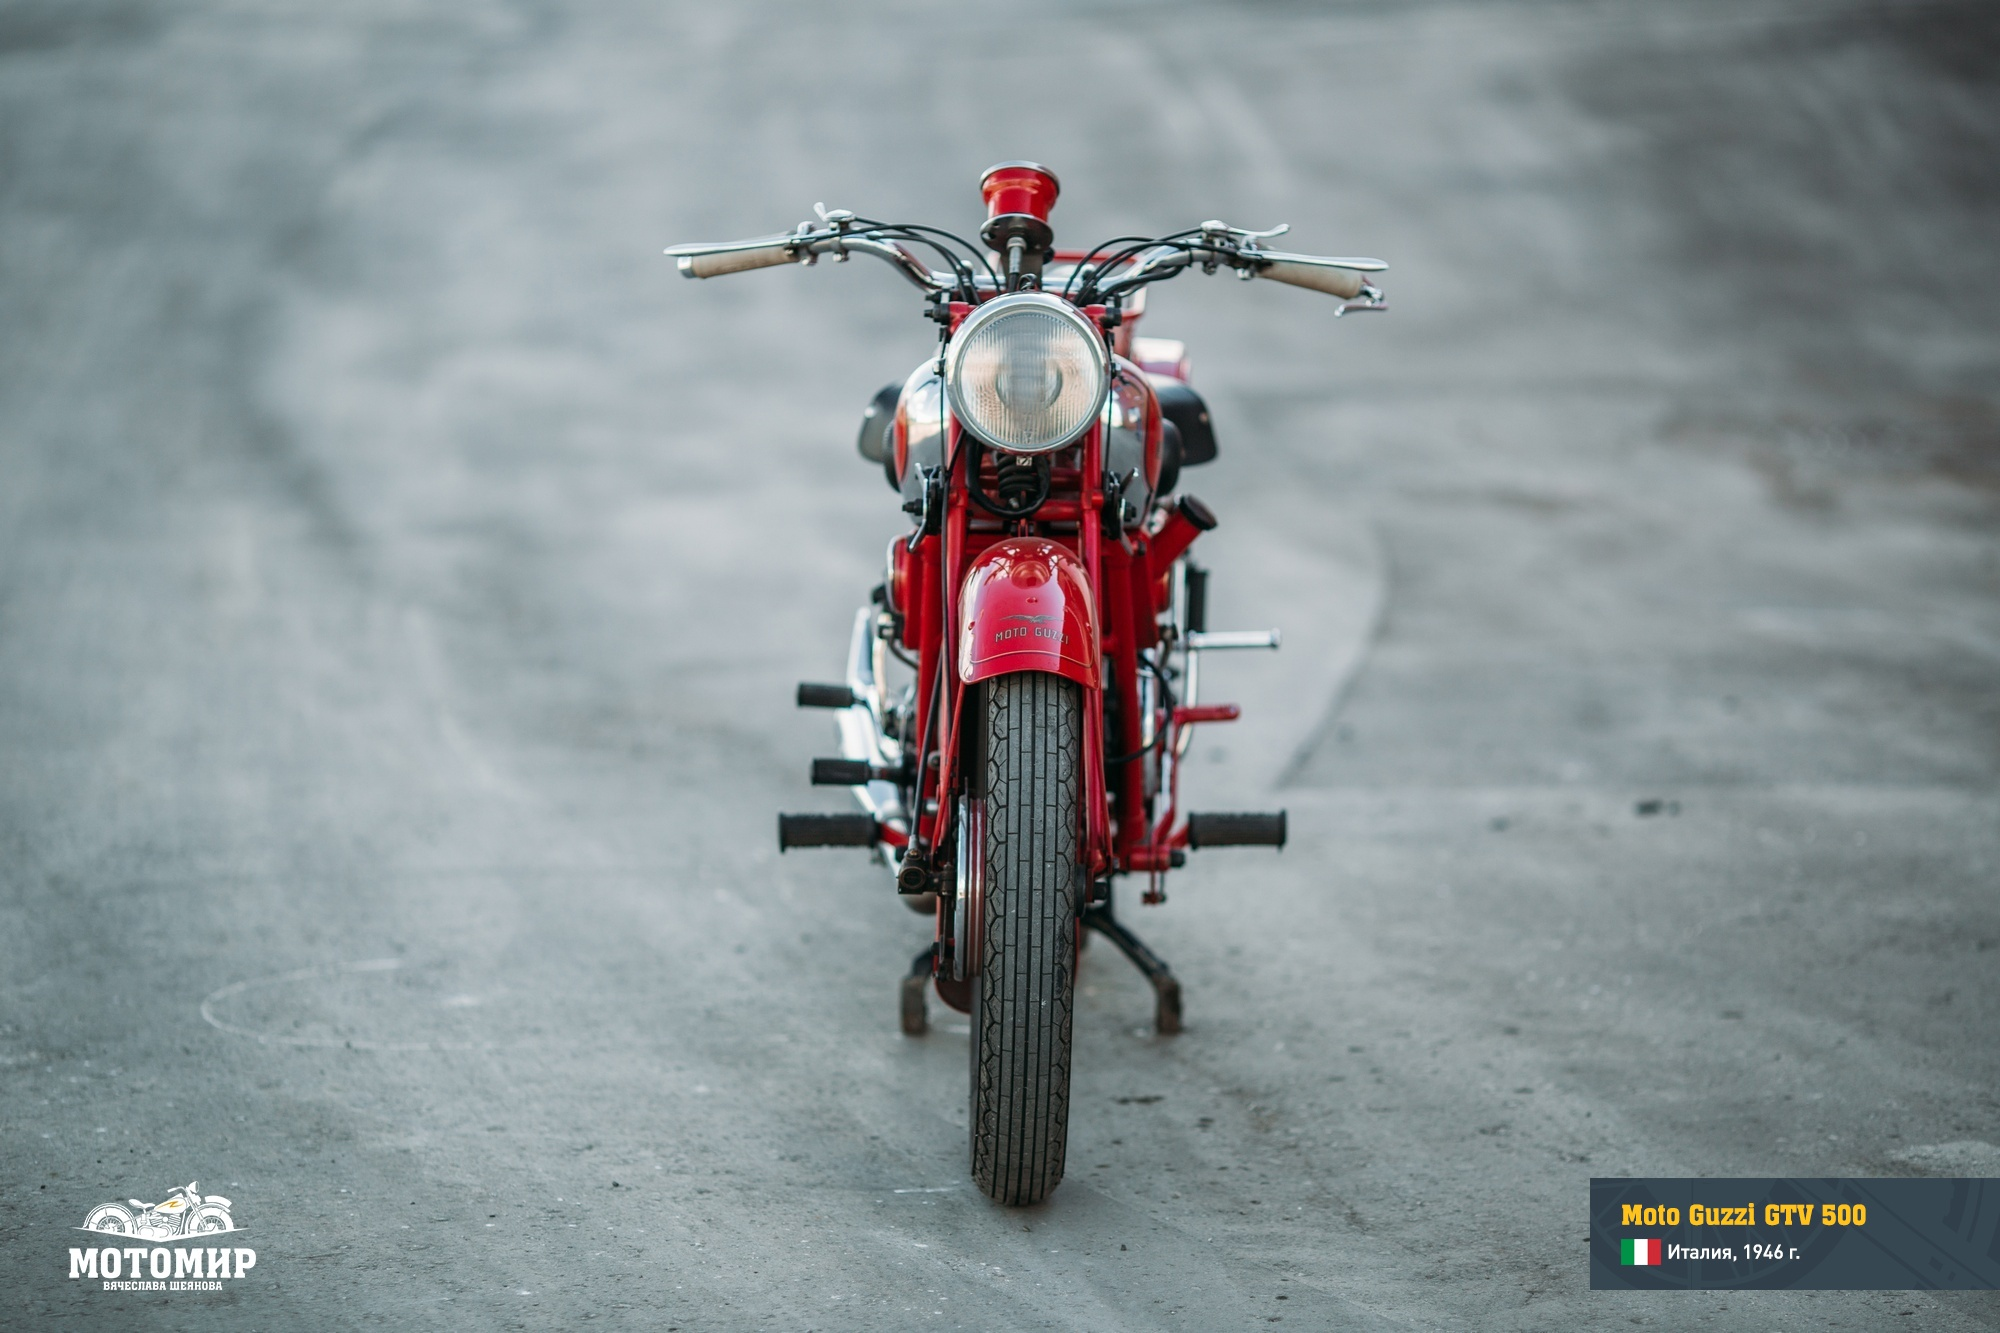 moto-guzzi-gtv-500-201509-web-07